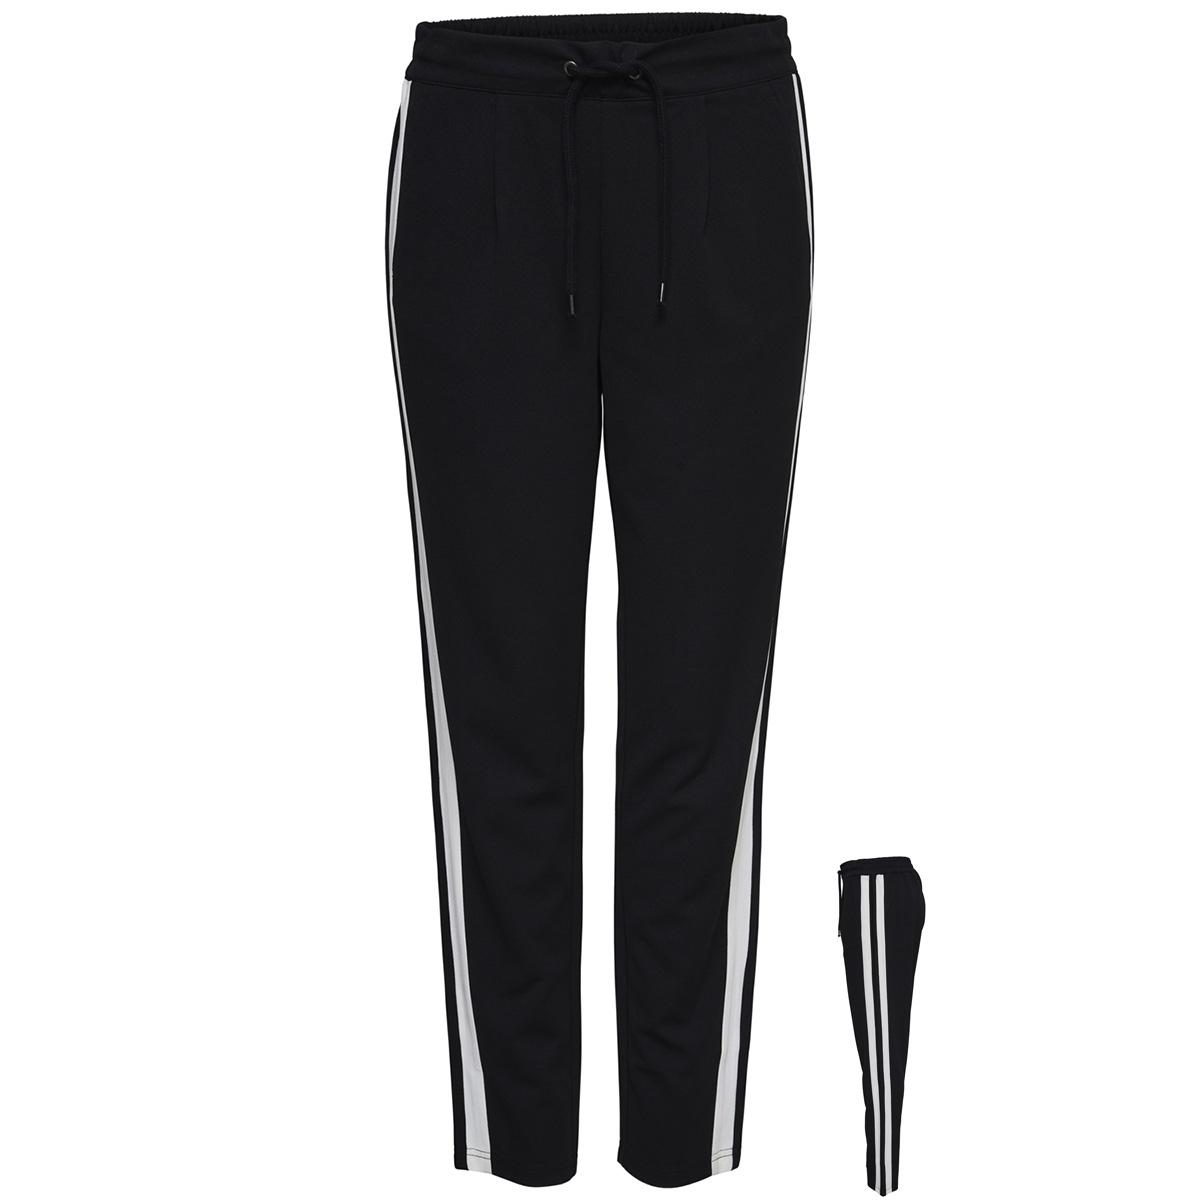 jdyviolet pant jrs exp 15167871 jacqueline de yong broek black/track stripes